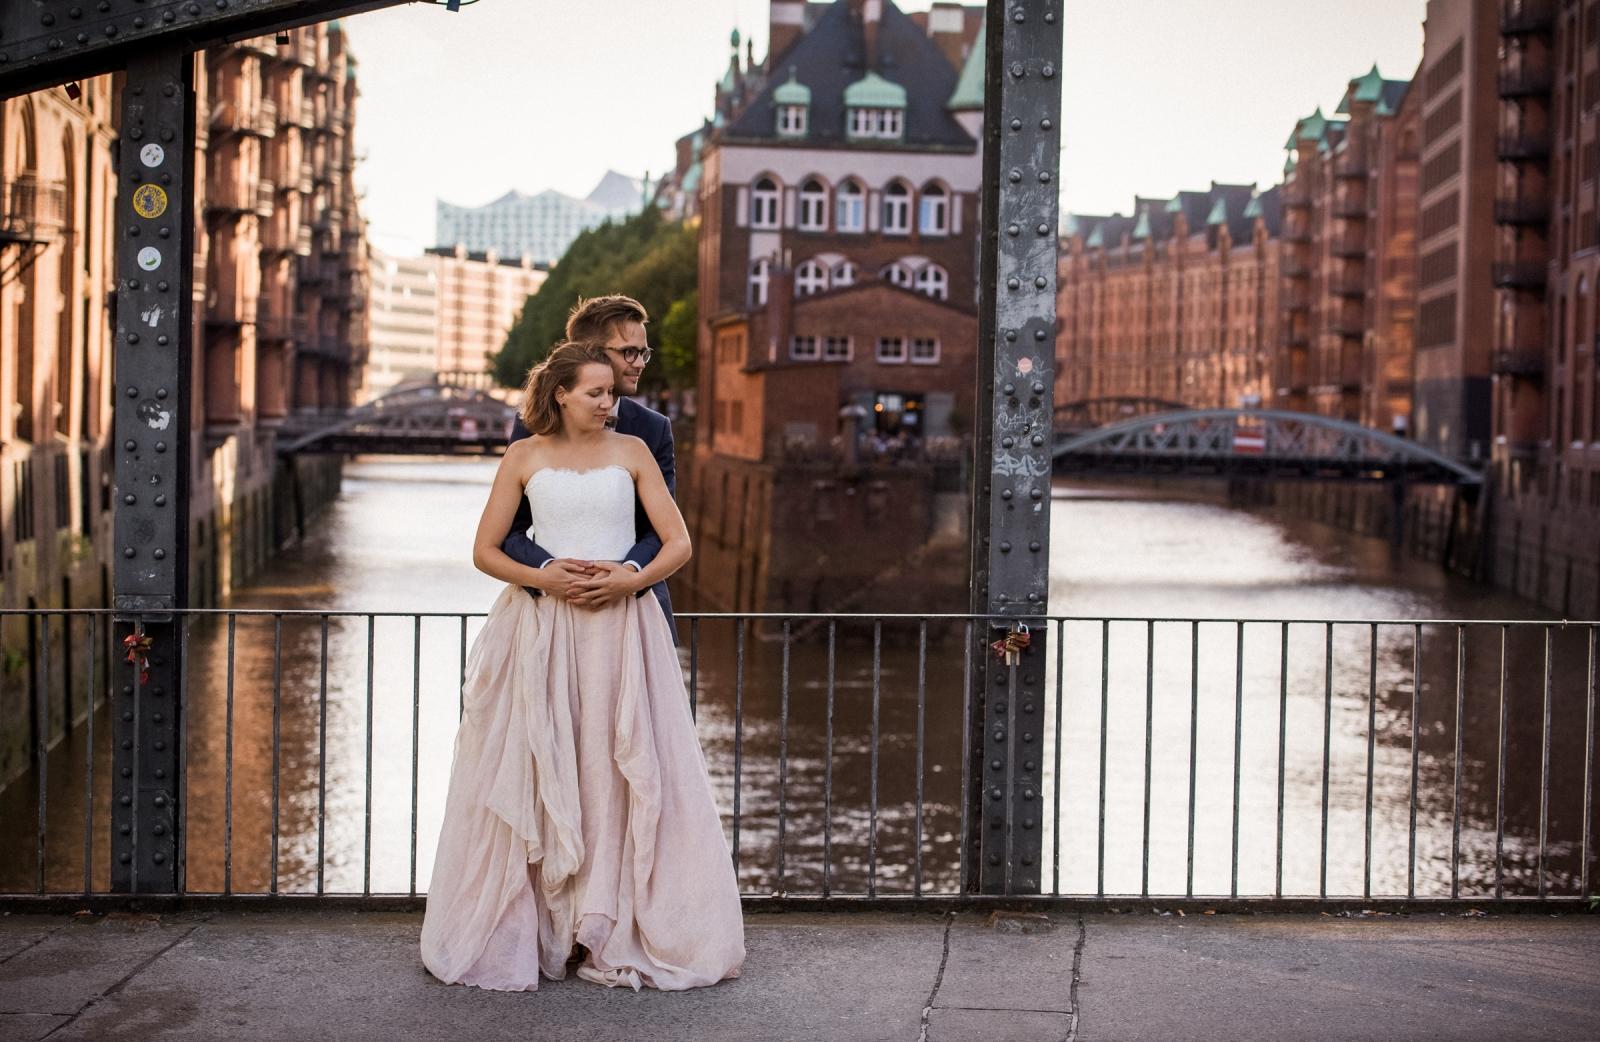 After Wedding Shooting in Hamburg am Wasserschloß